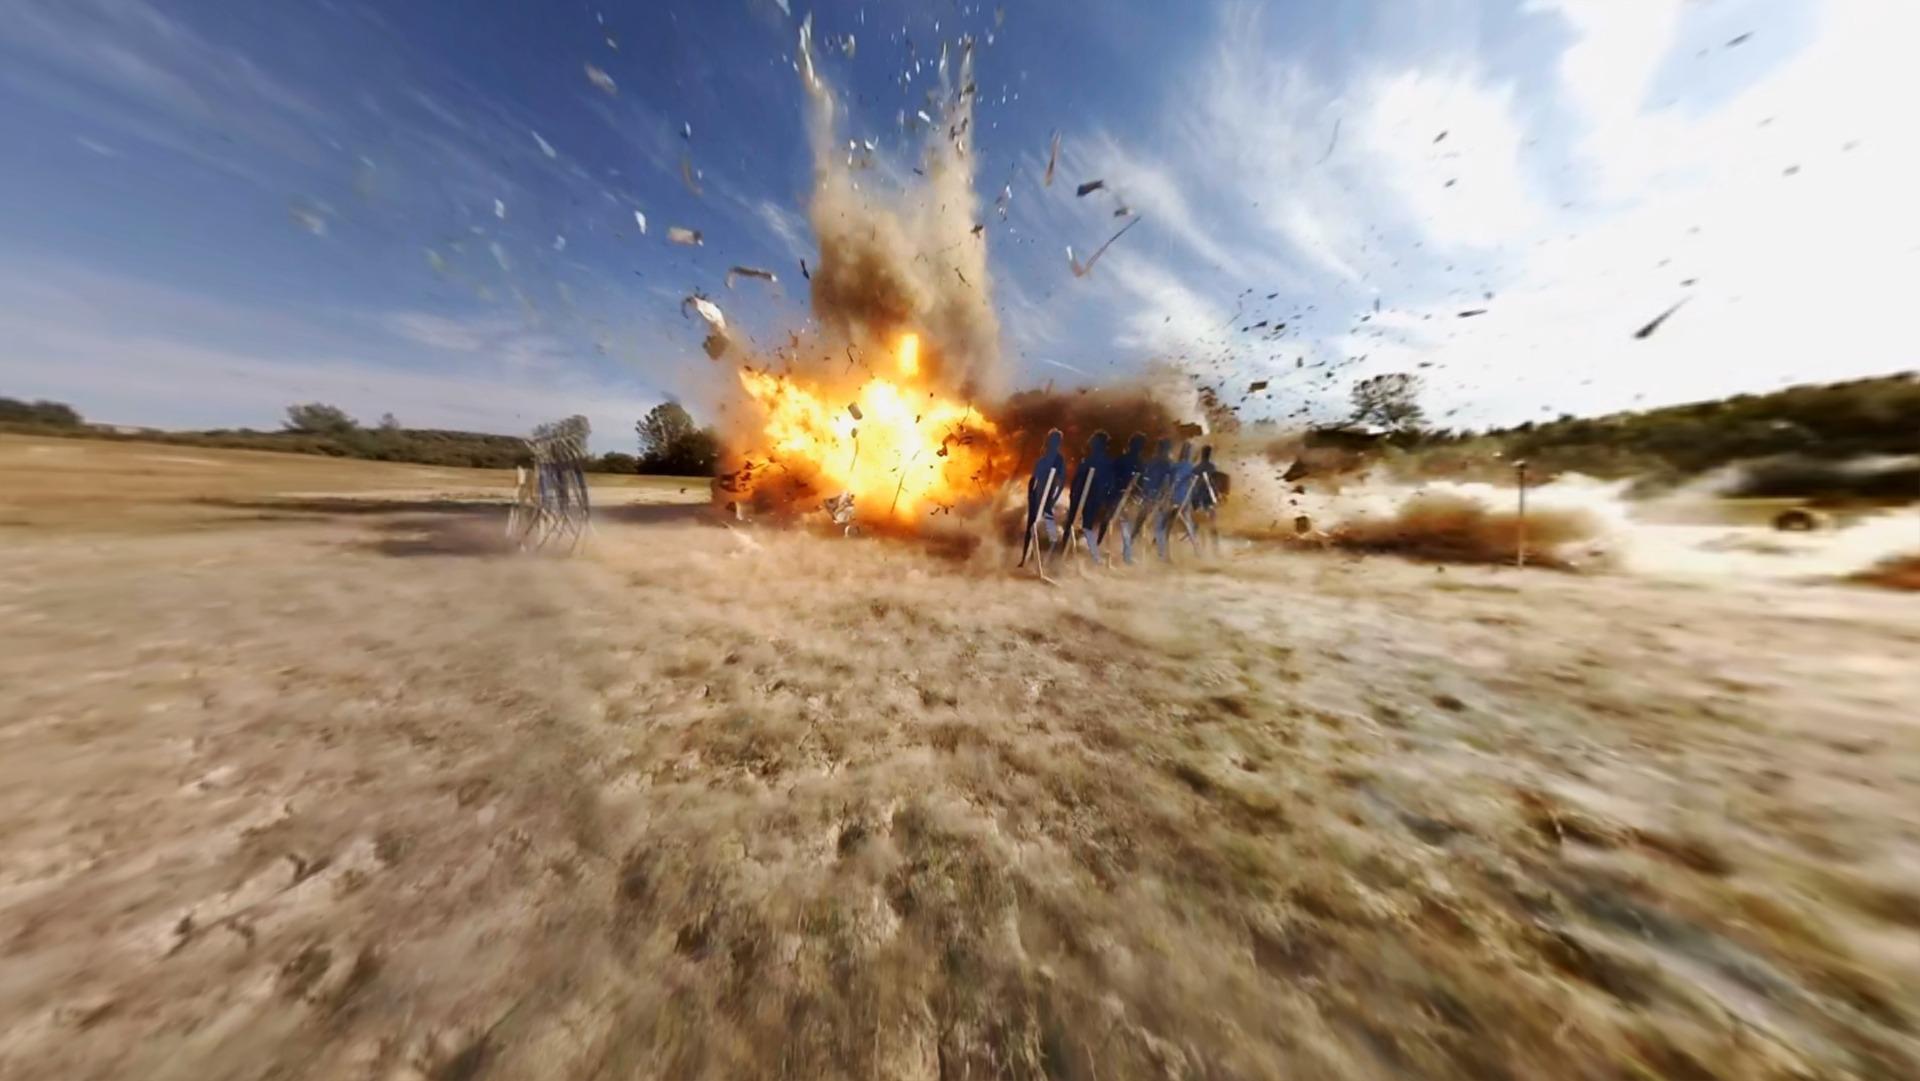 postal-van-explosion-mythbusters-07